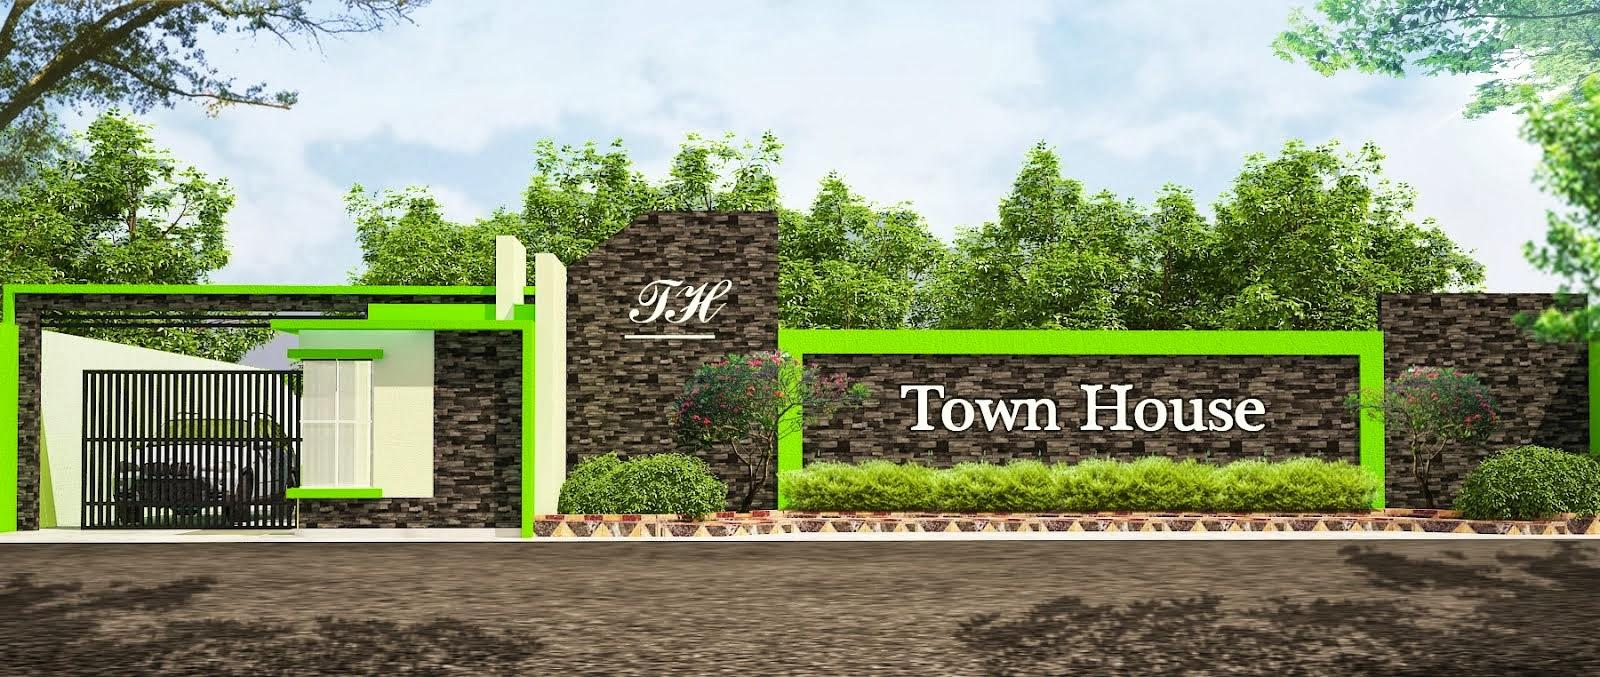 TFQ architects: Gambar Gerbang perumahan townhouse jakarta